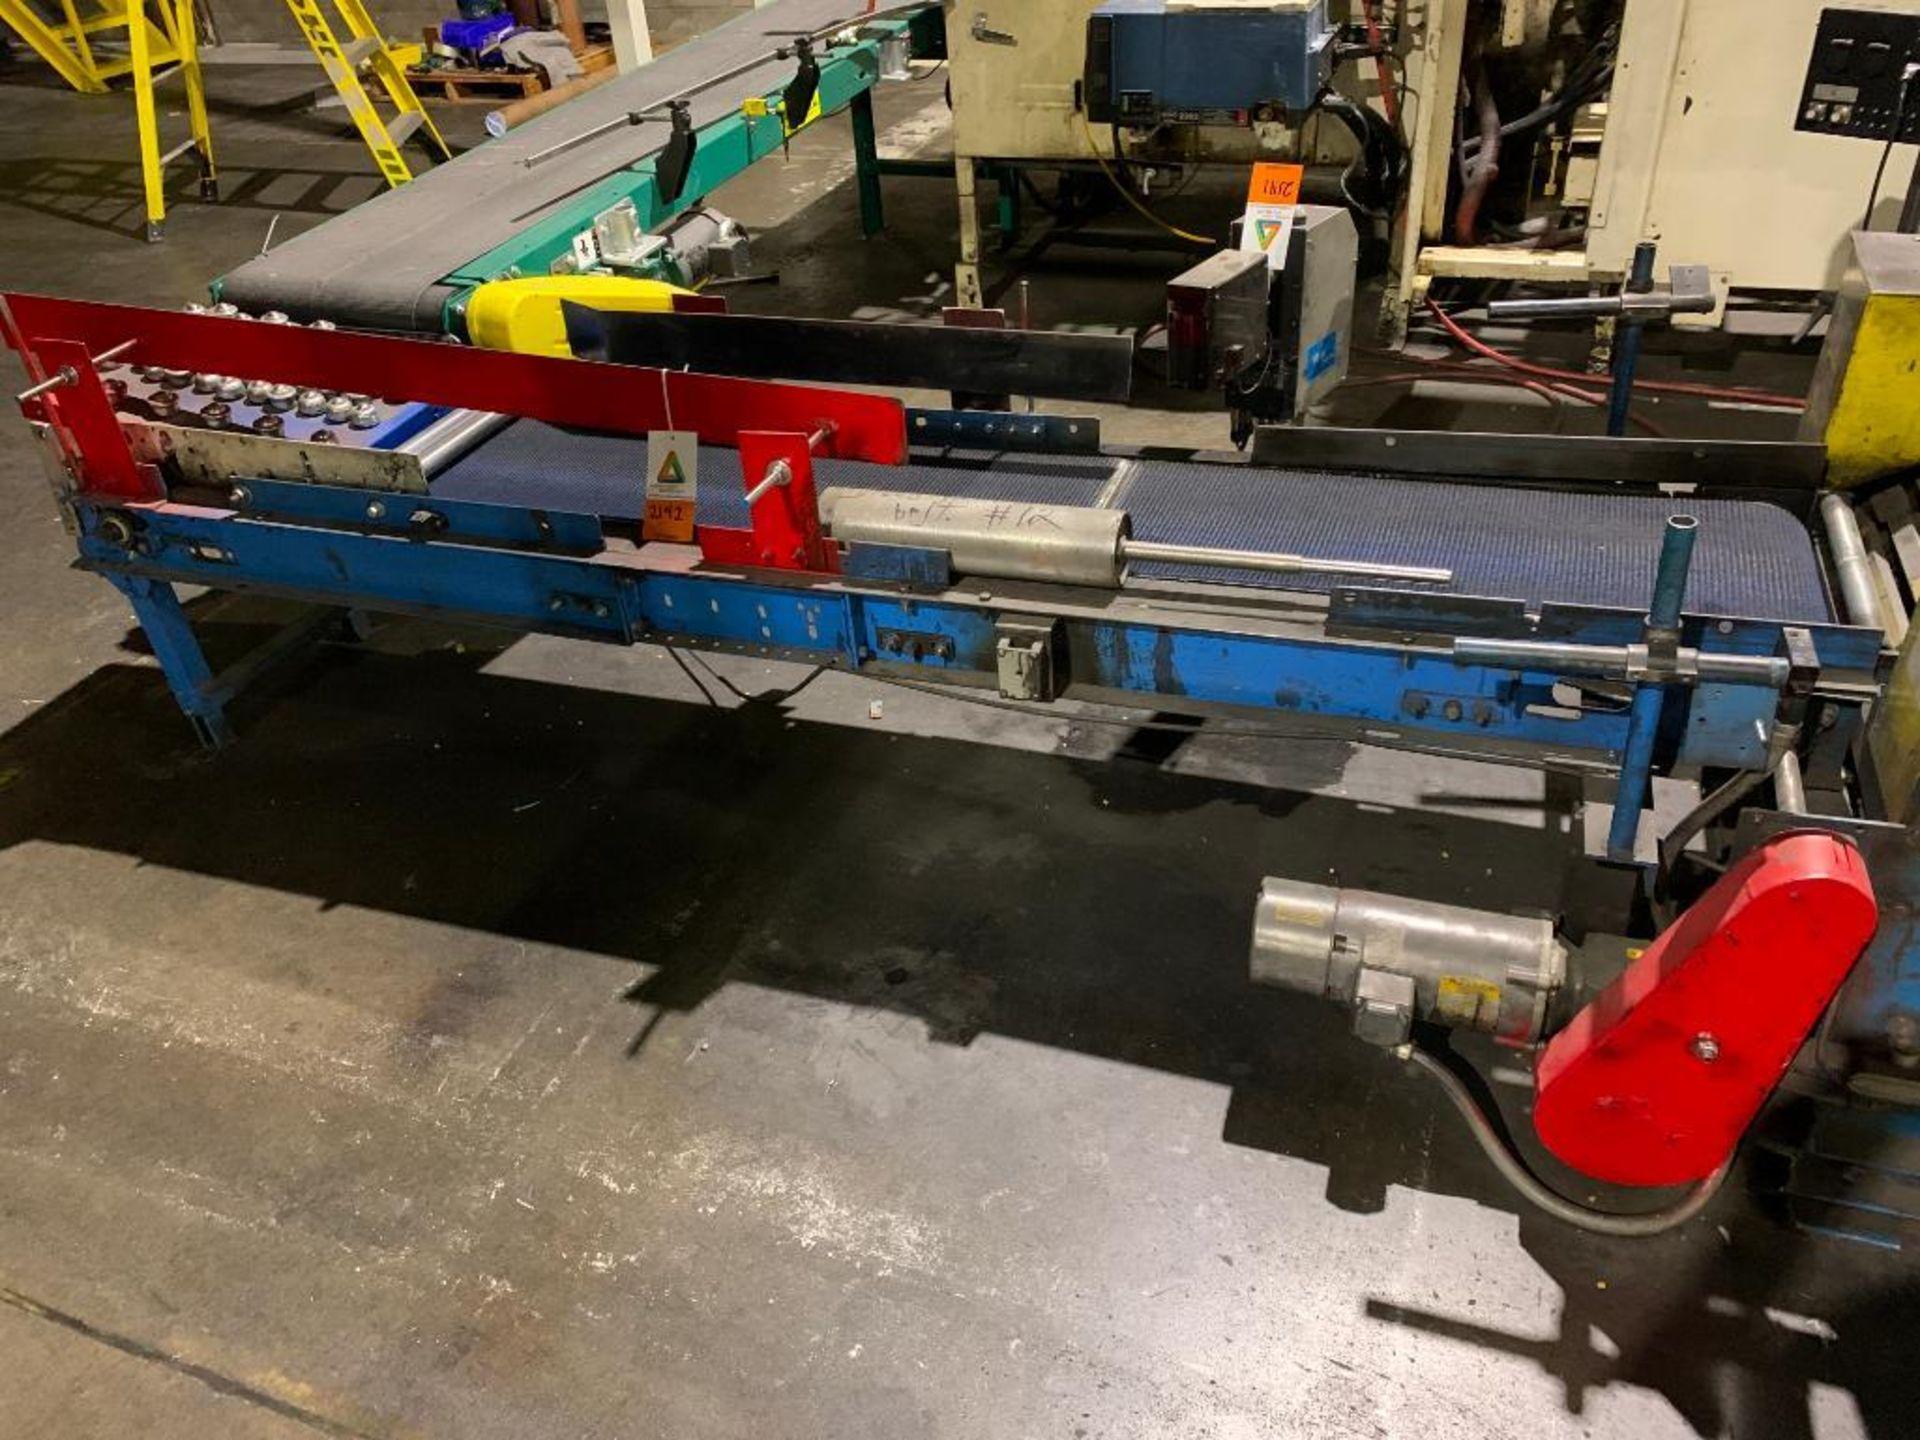 mild steel conveyor - Image 6 of 11